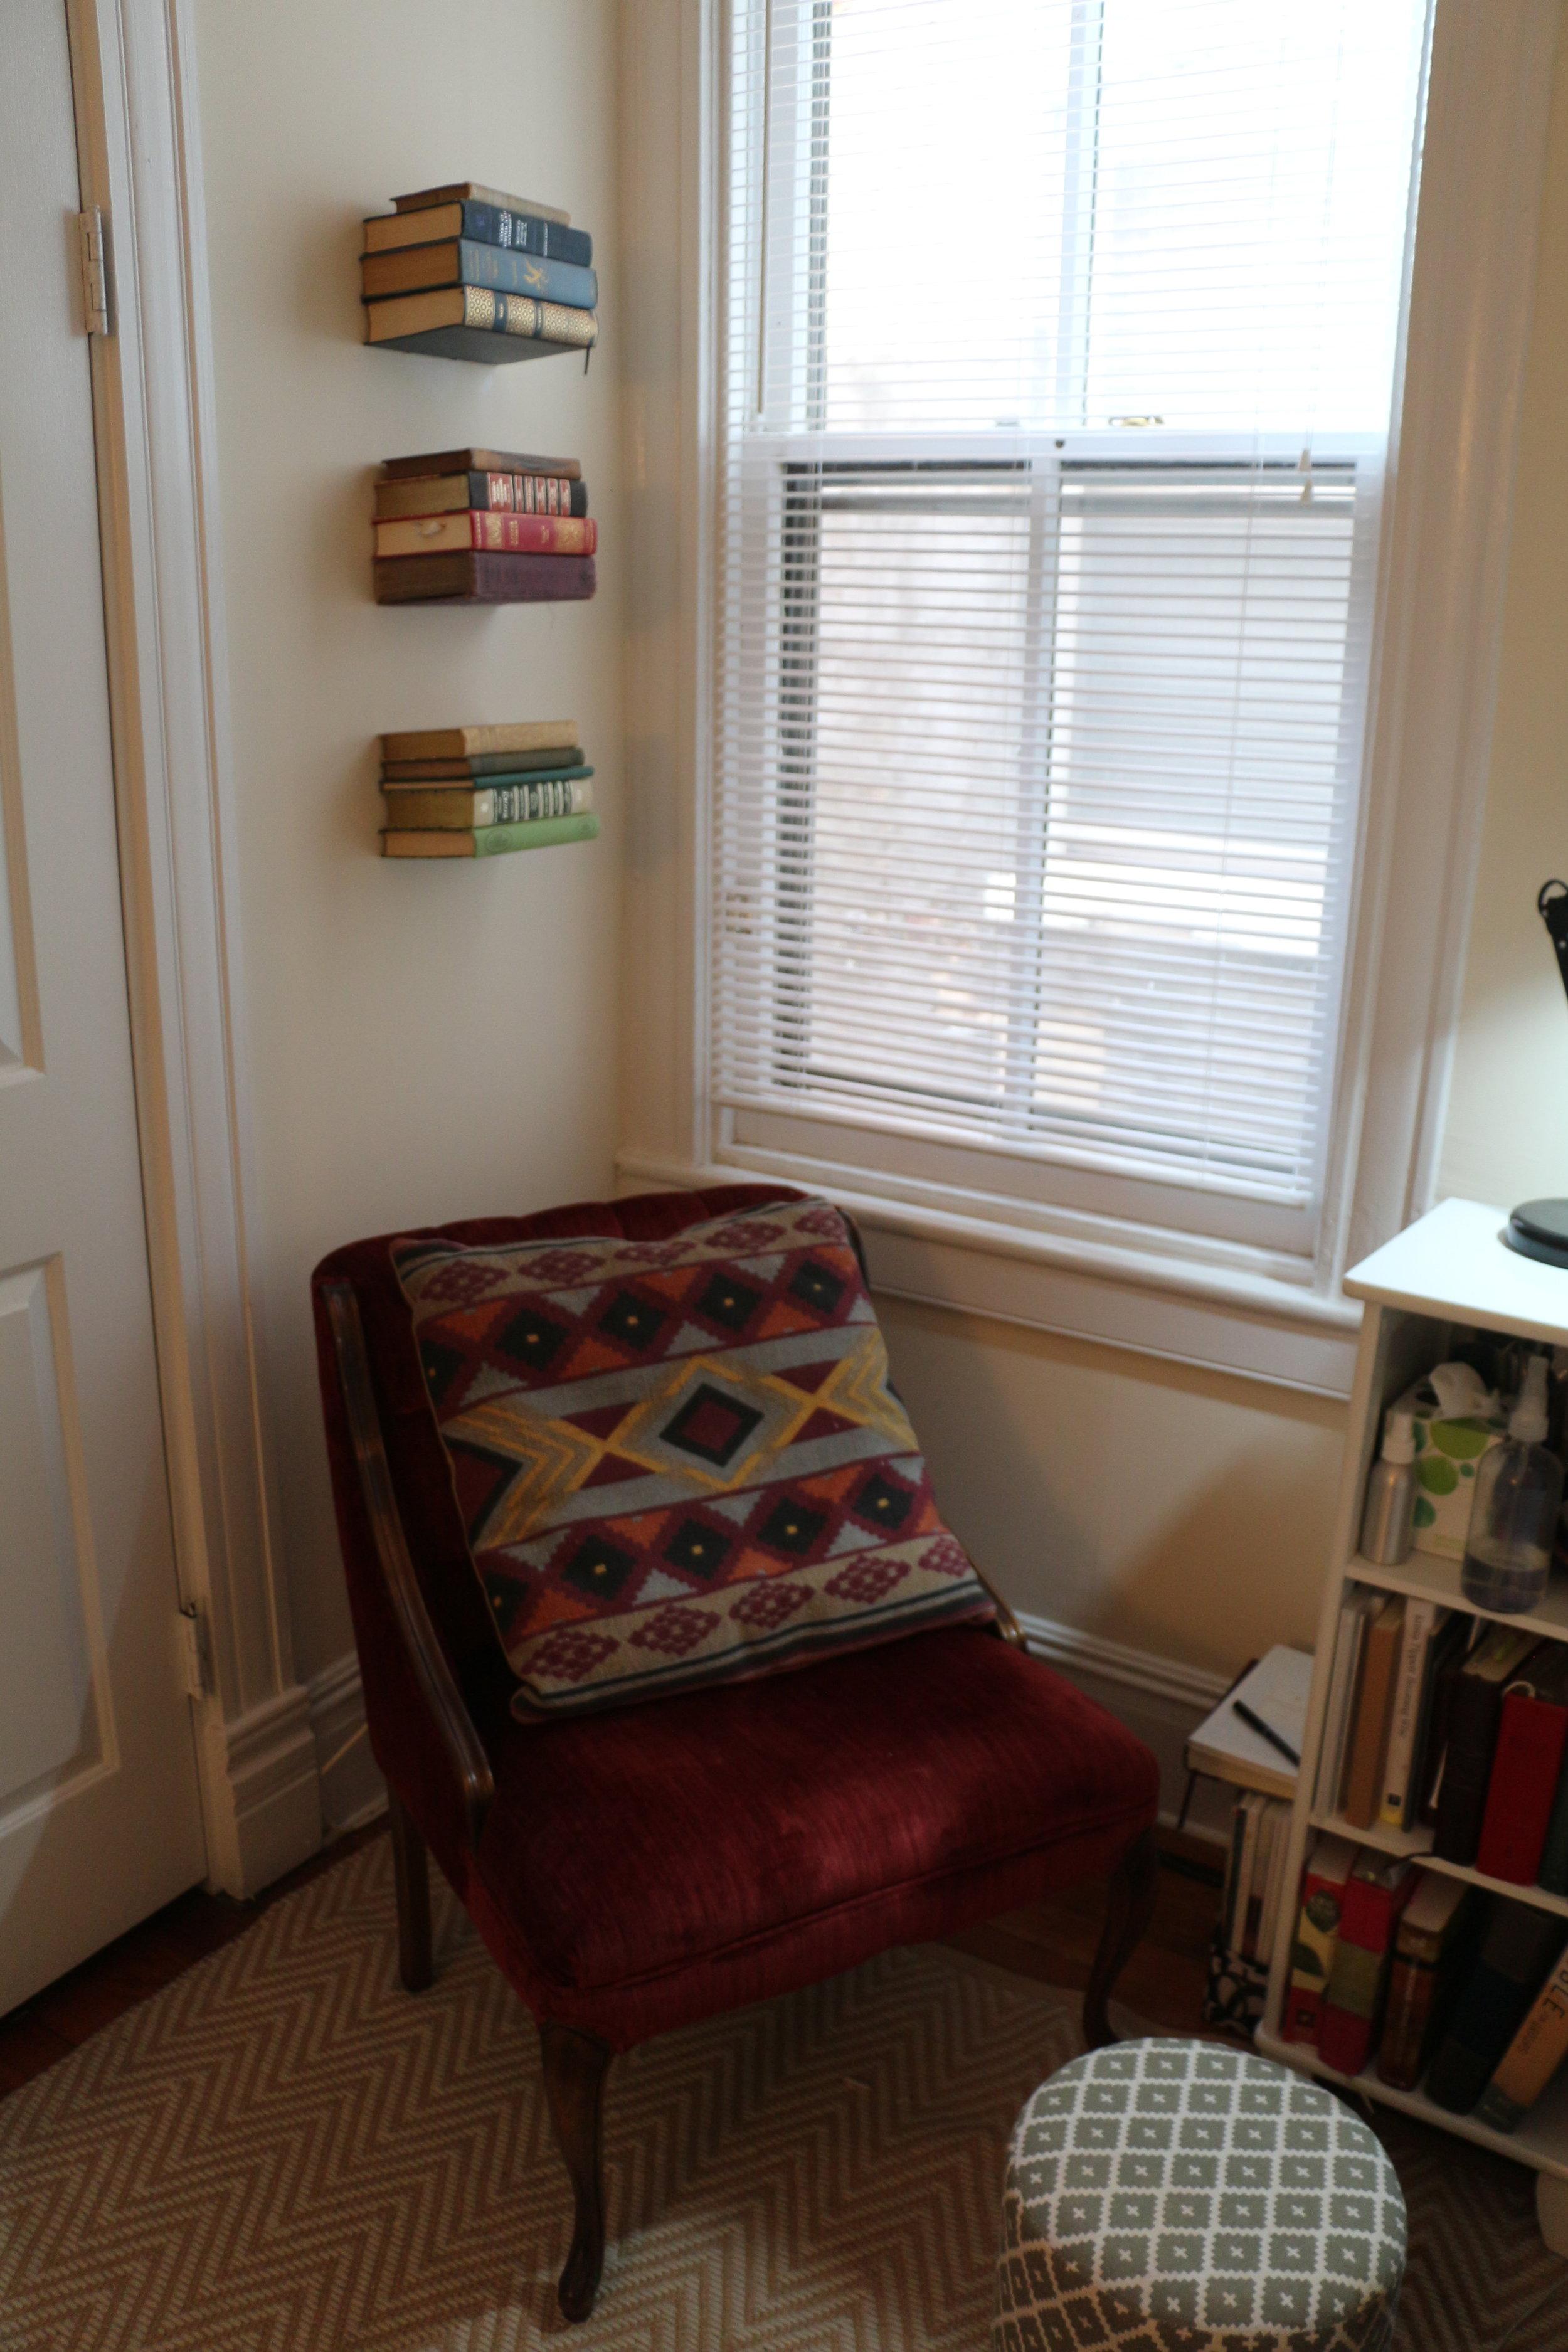 My cozy little reading corner